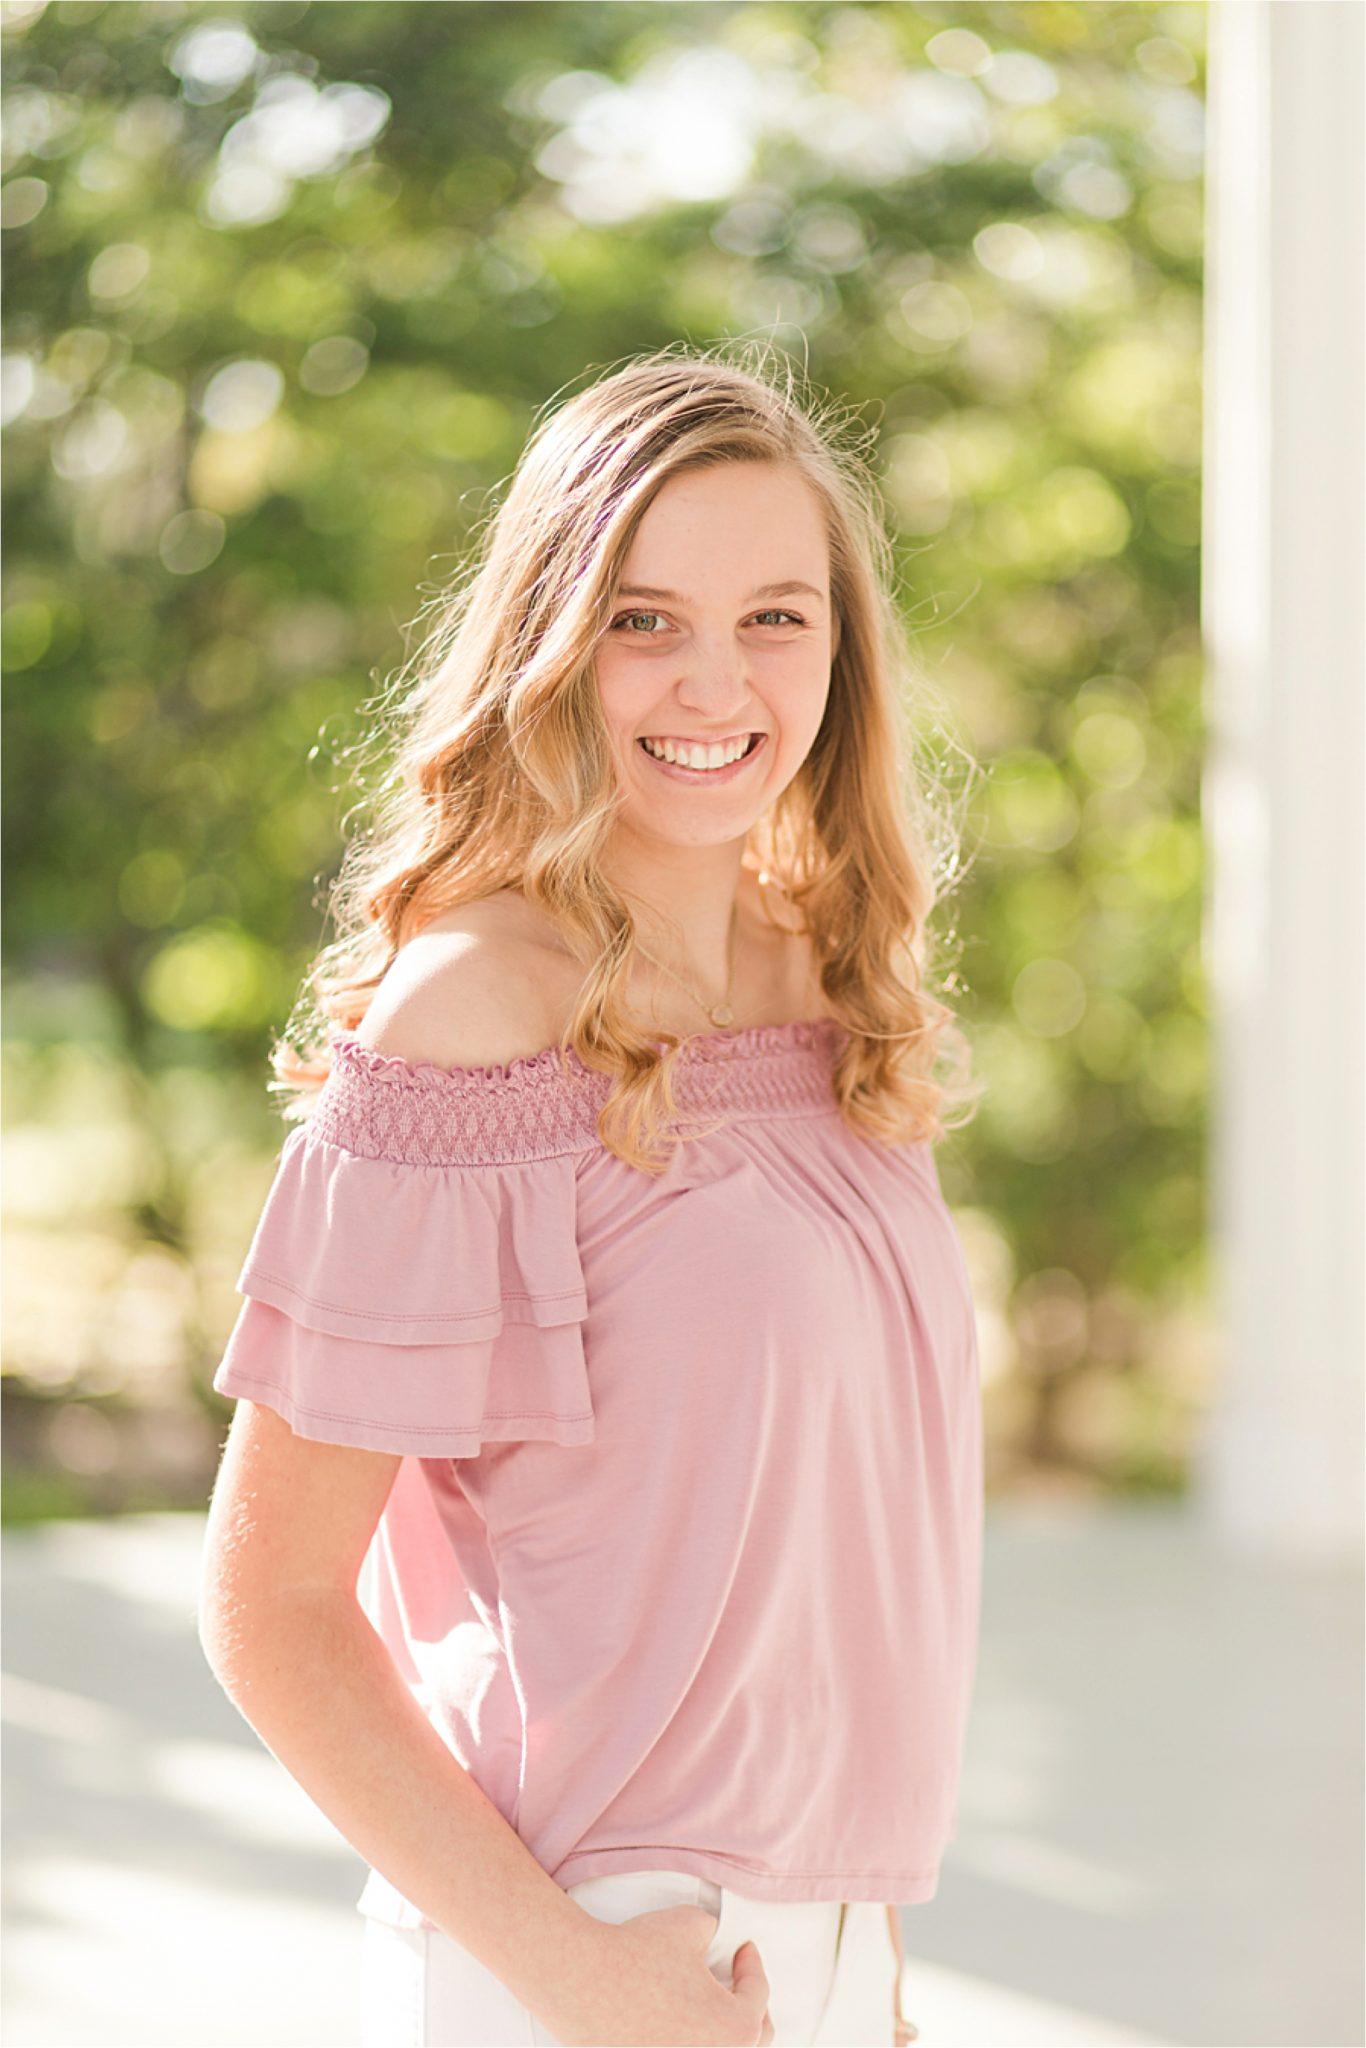 Bragg Mitchell Mansion-Senior Photo Session-Alabama Photographer-Portraits